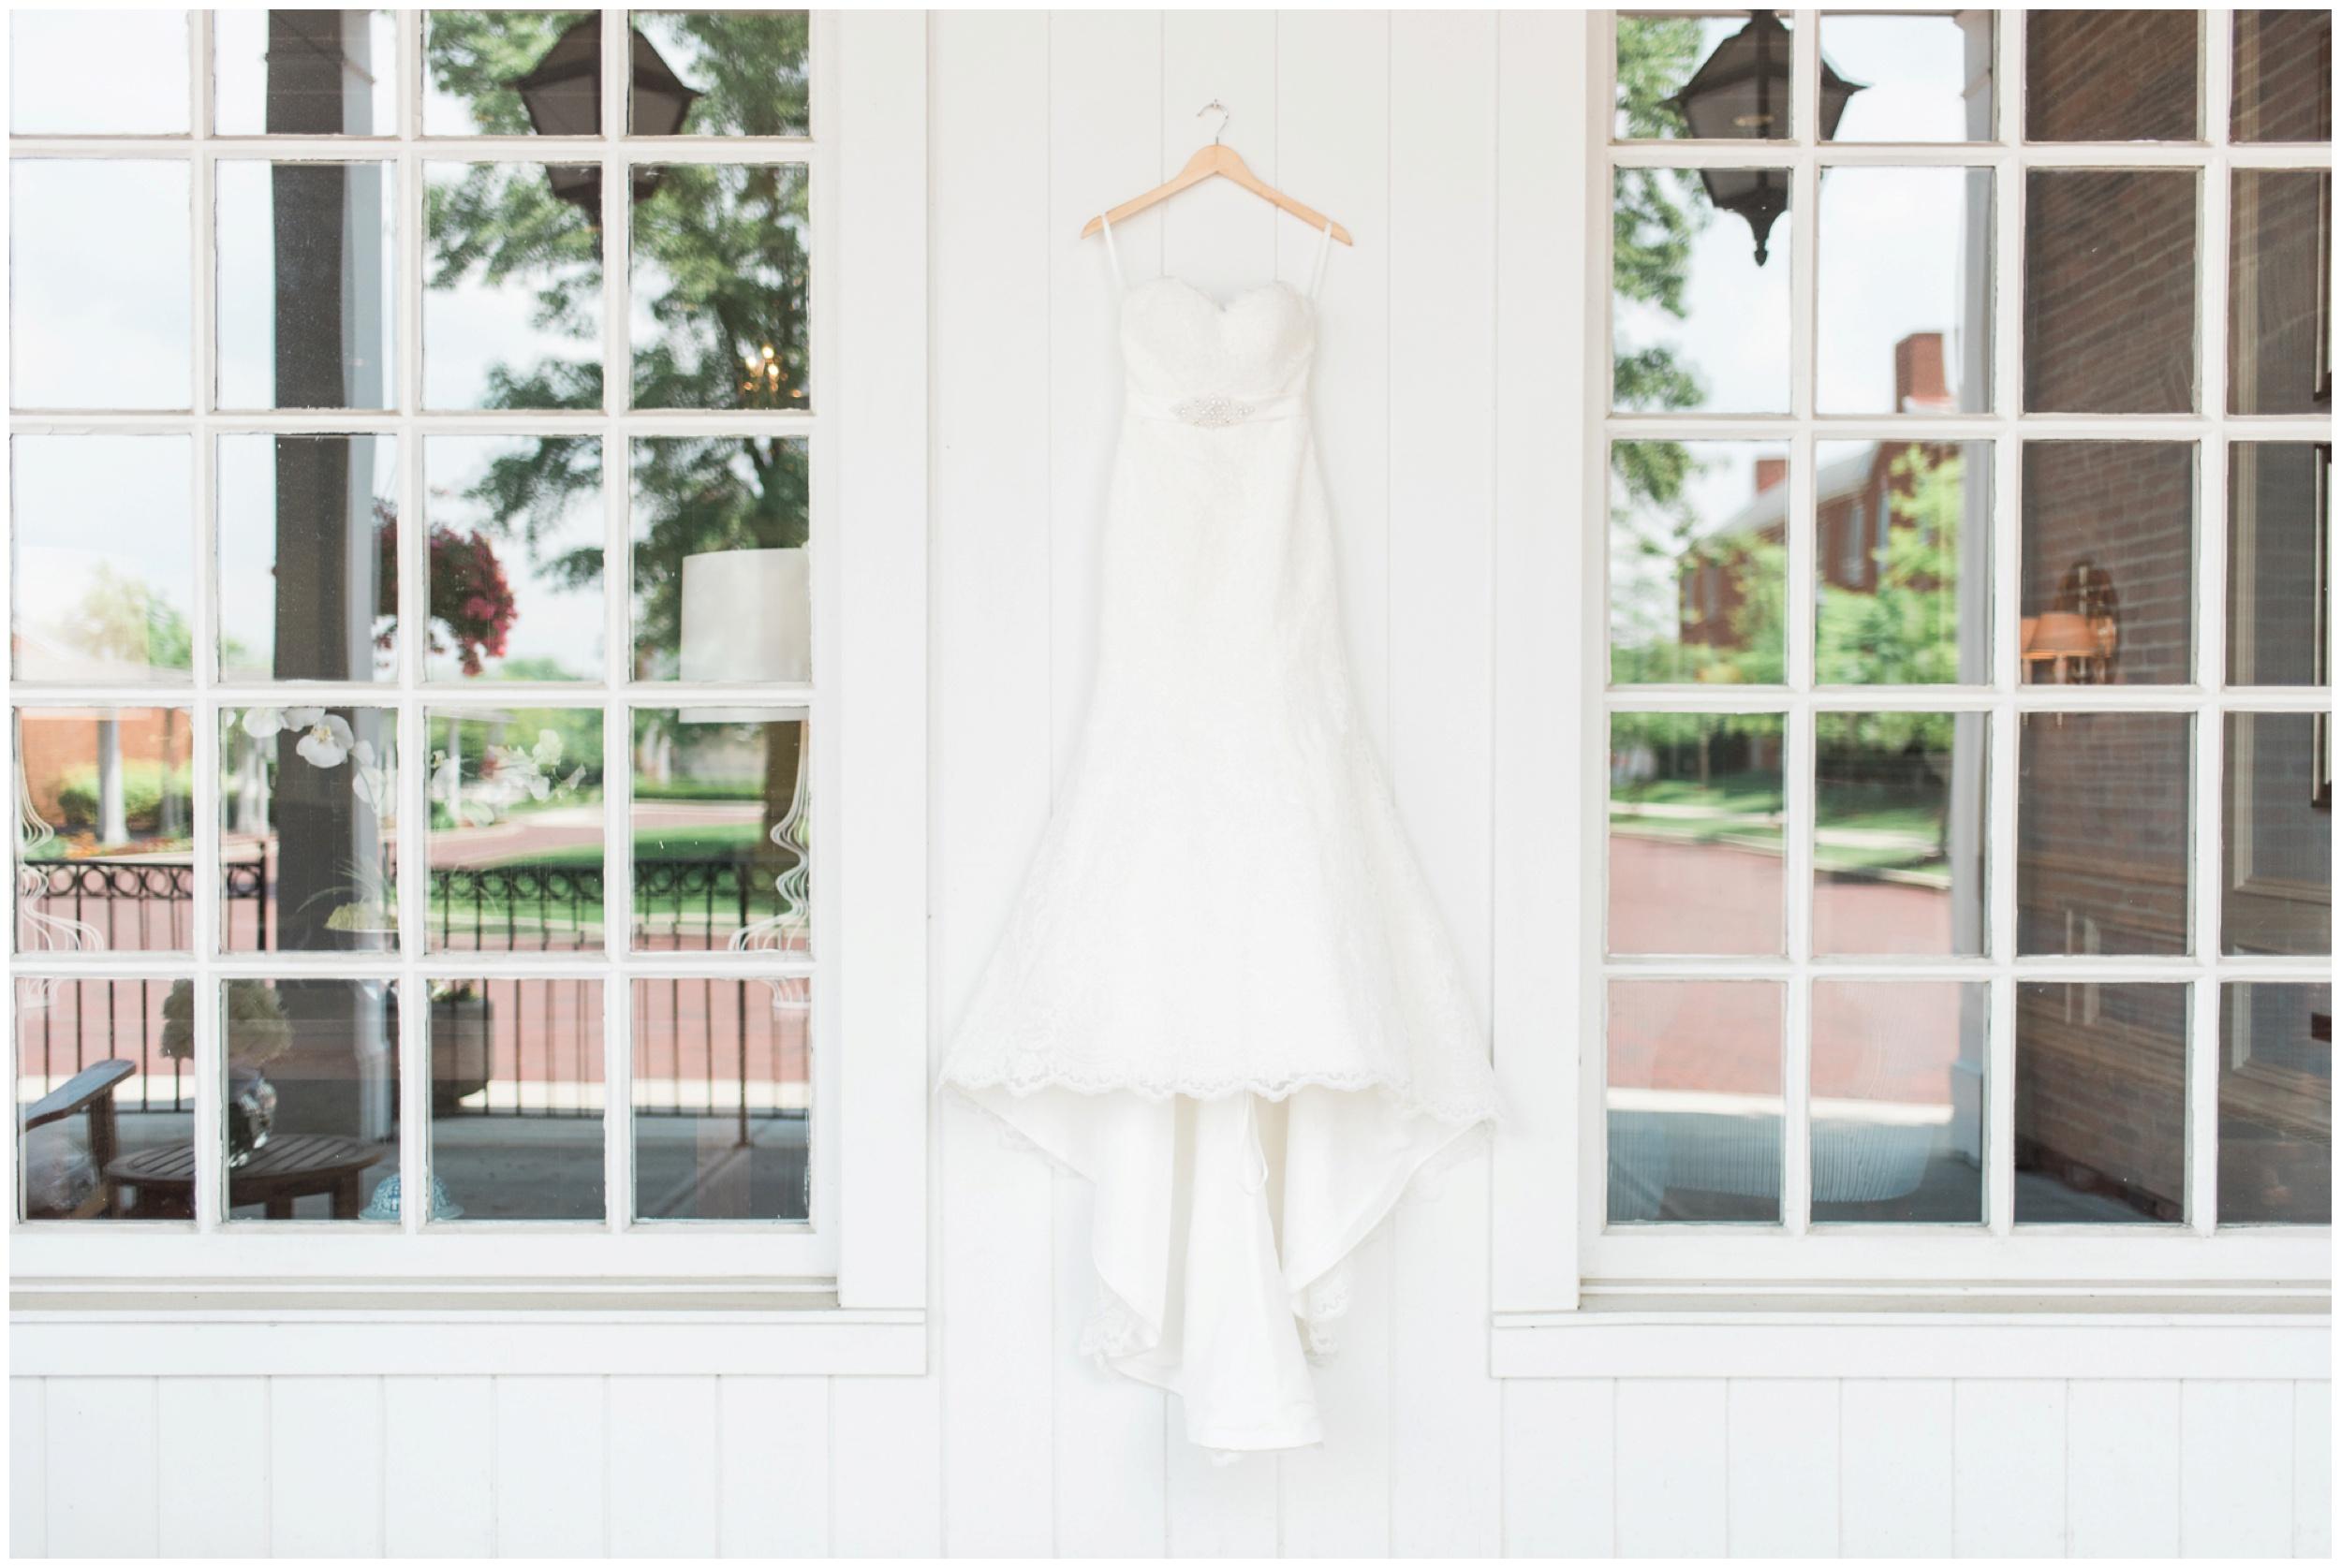 nationwide-hotel-conference-center-wedding-7.jpg